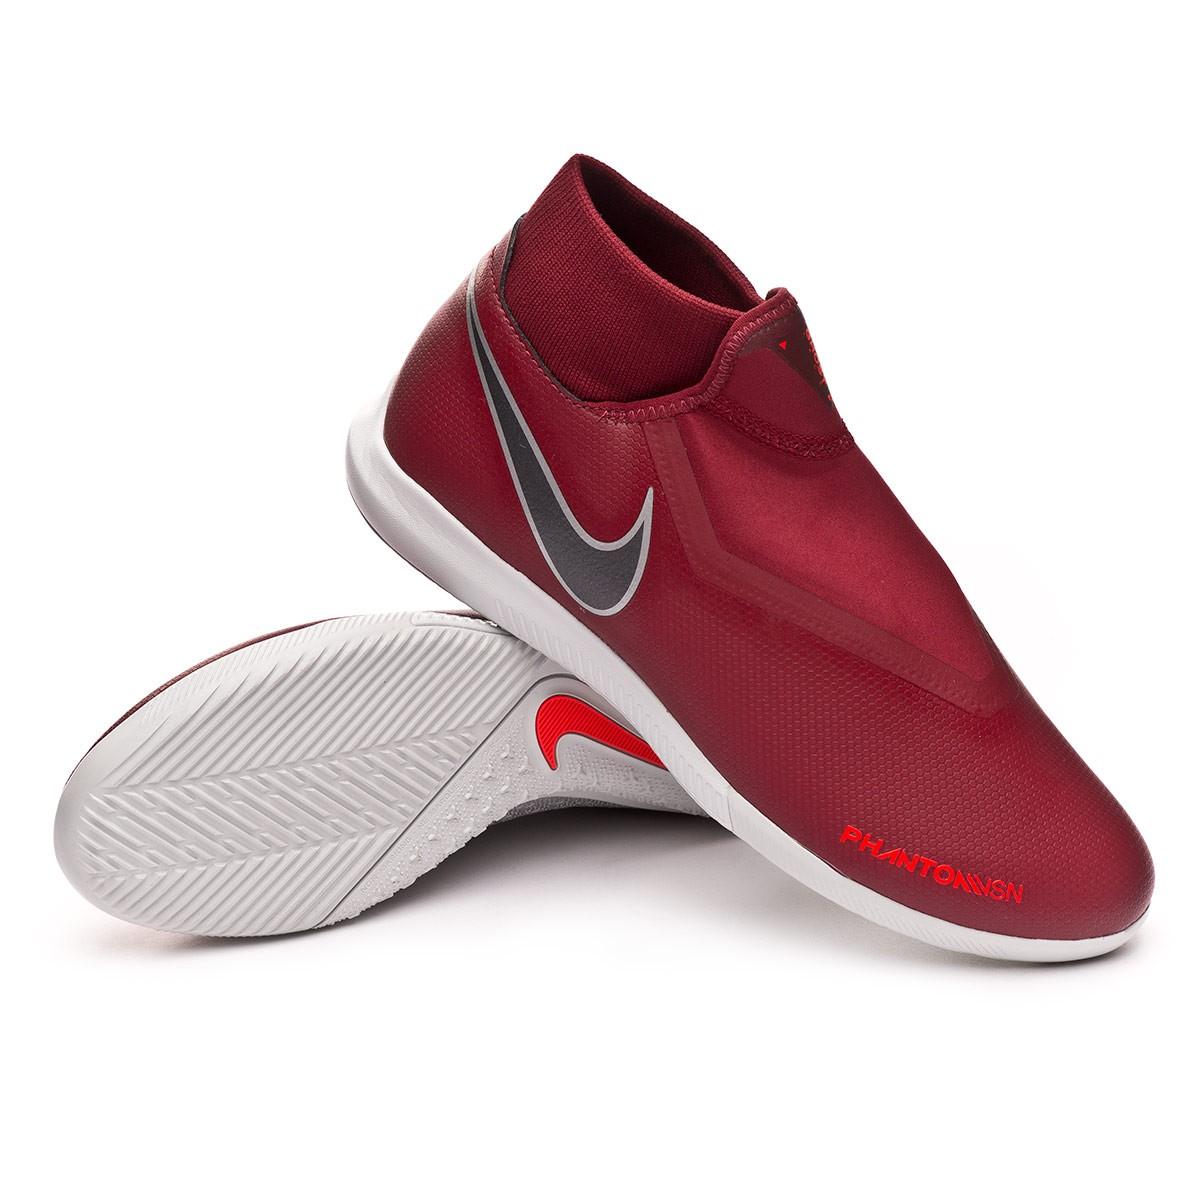 bc99ac53eff Nike Phantom Vision Academy DF IC Futsal Boot. Team red-Metallic dark ...